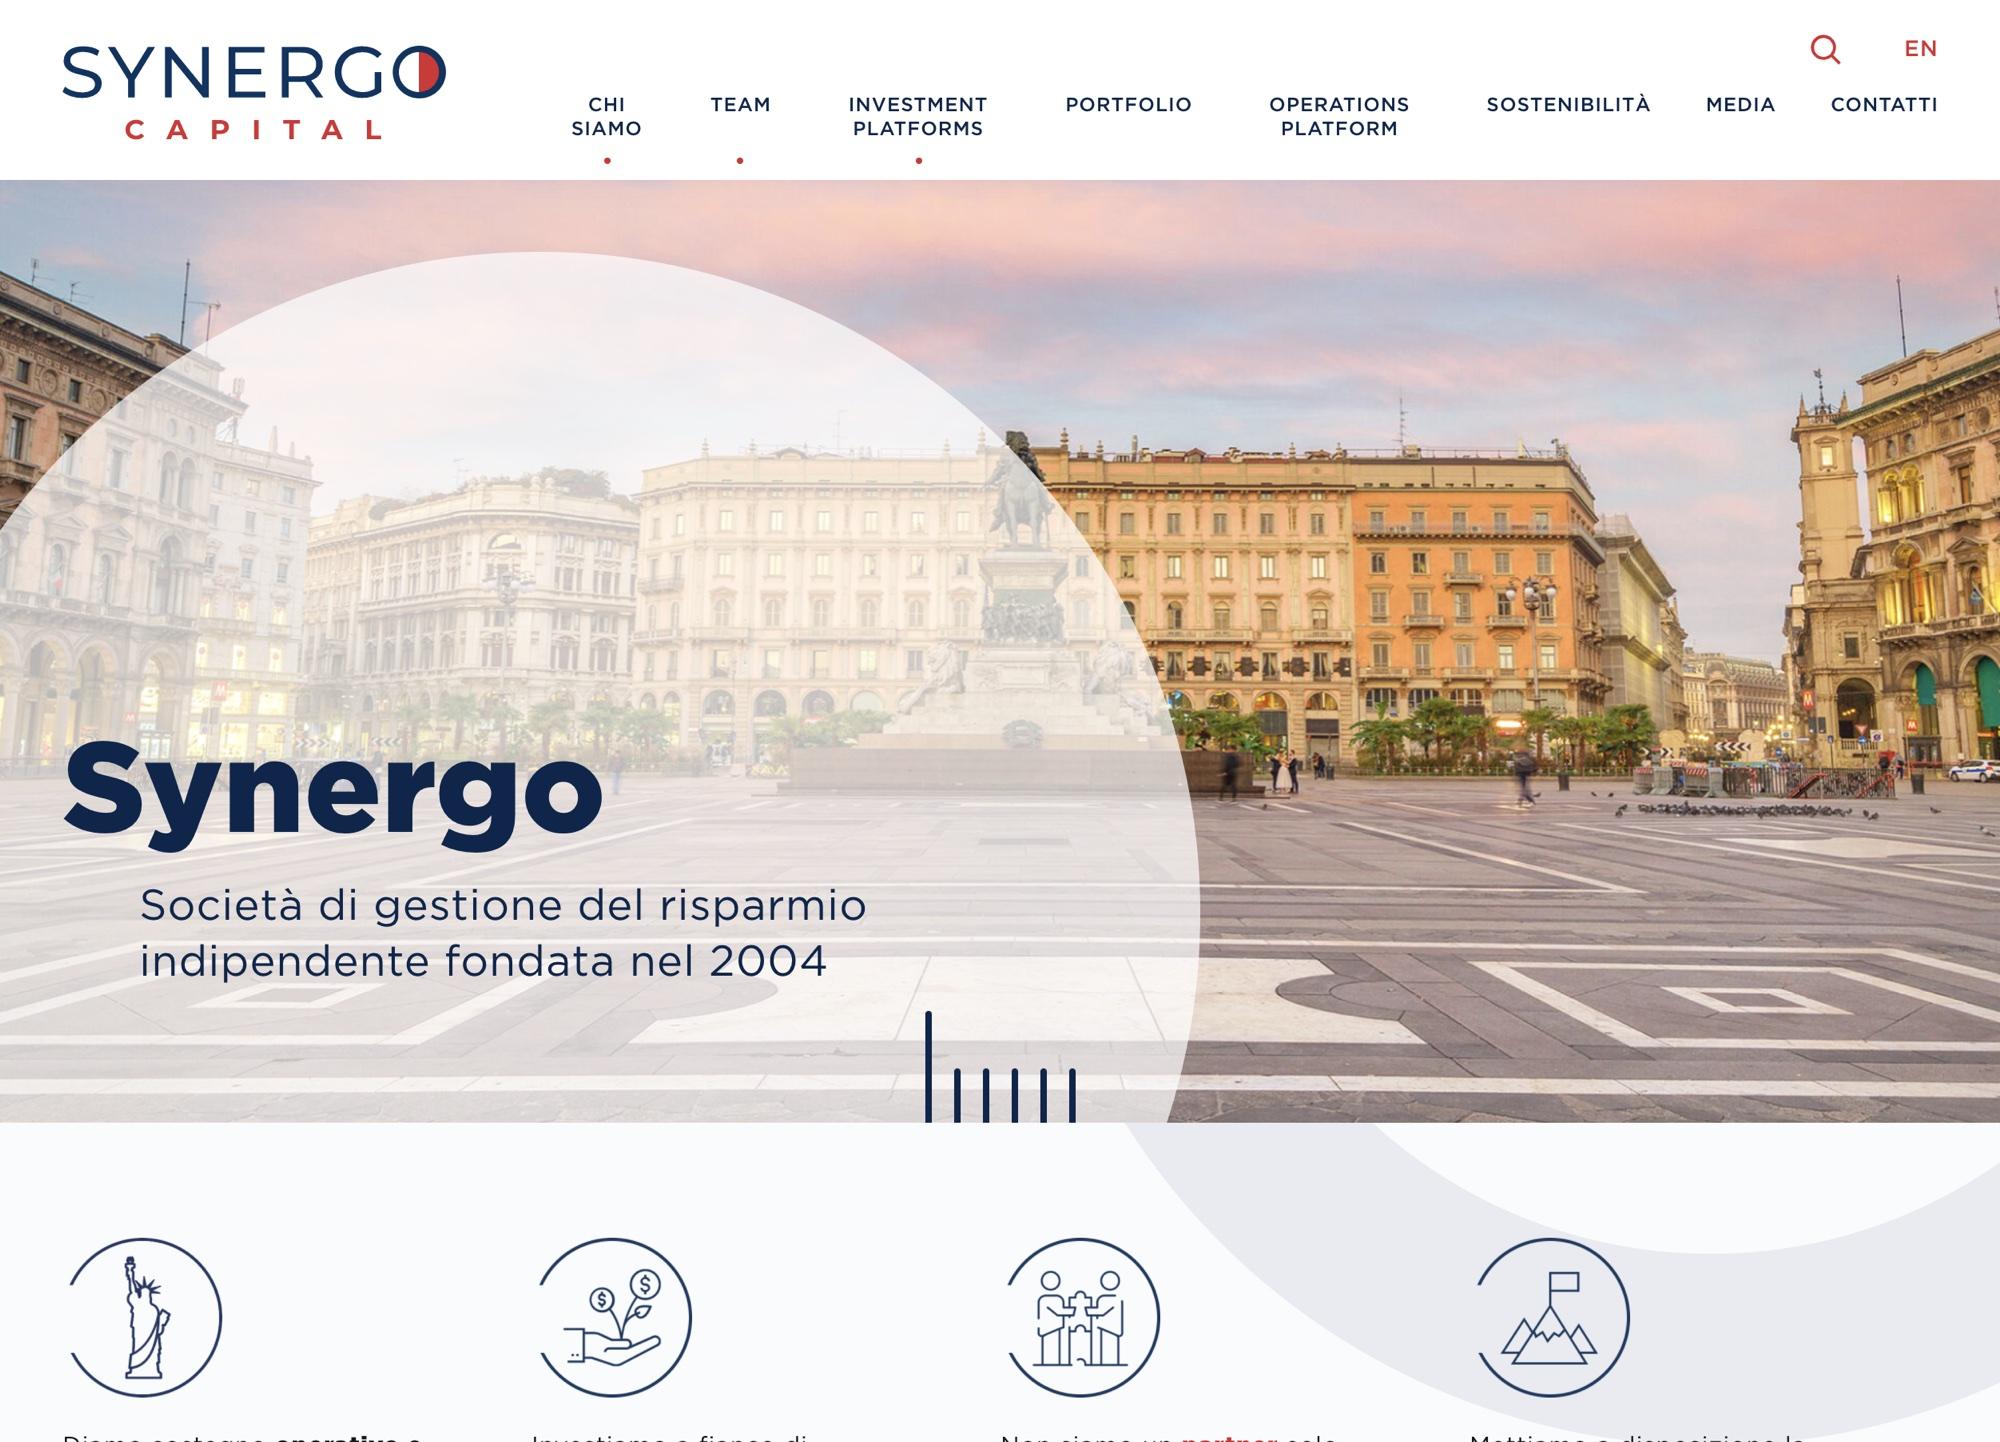 Synergo Capital Sgr